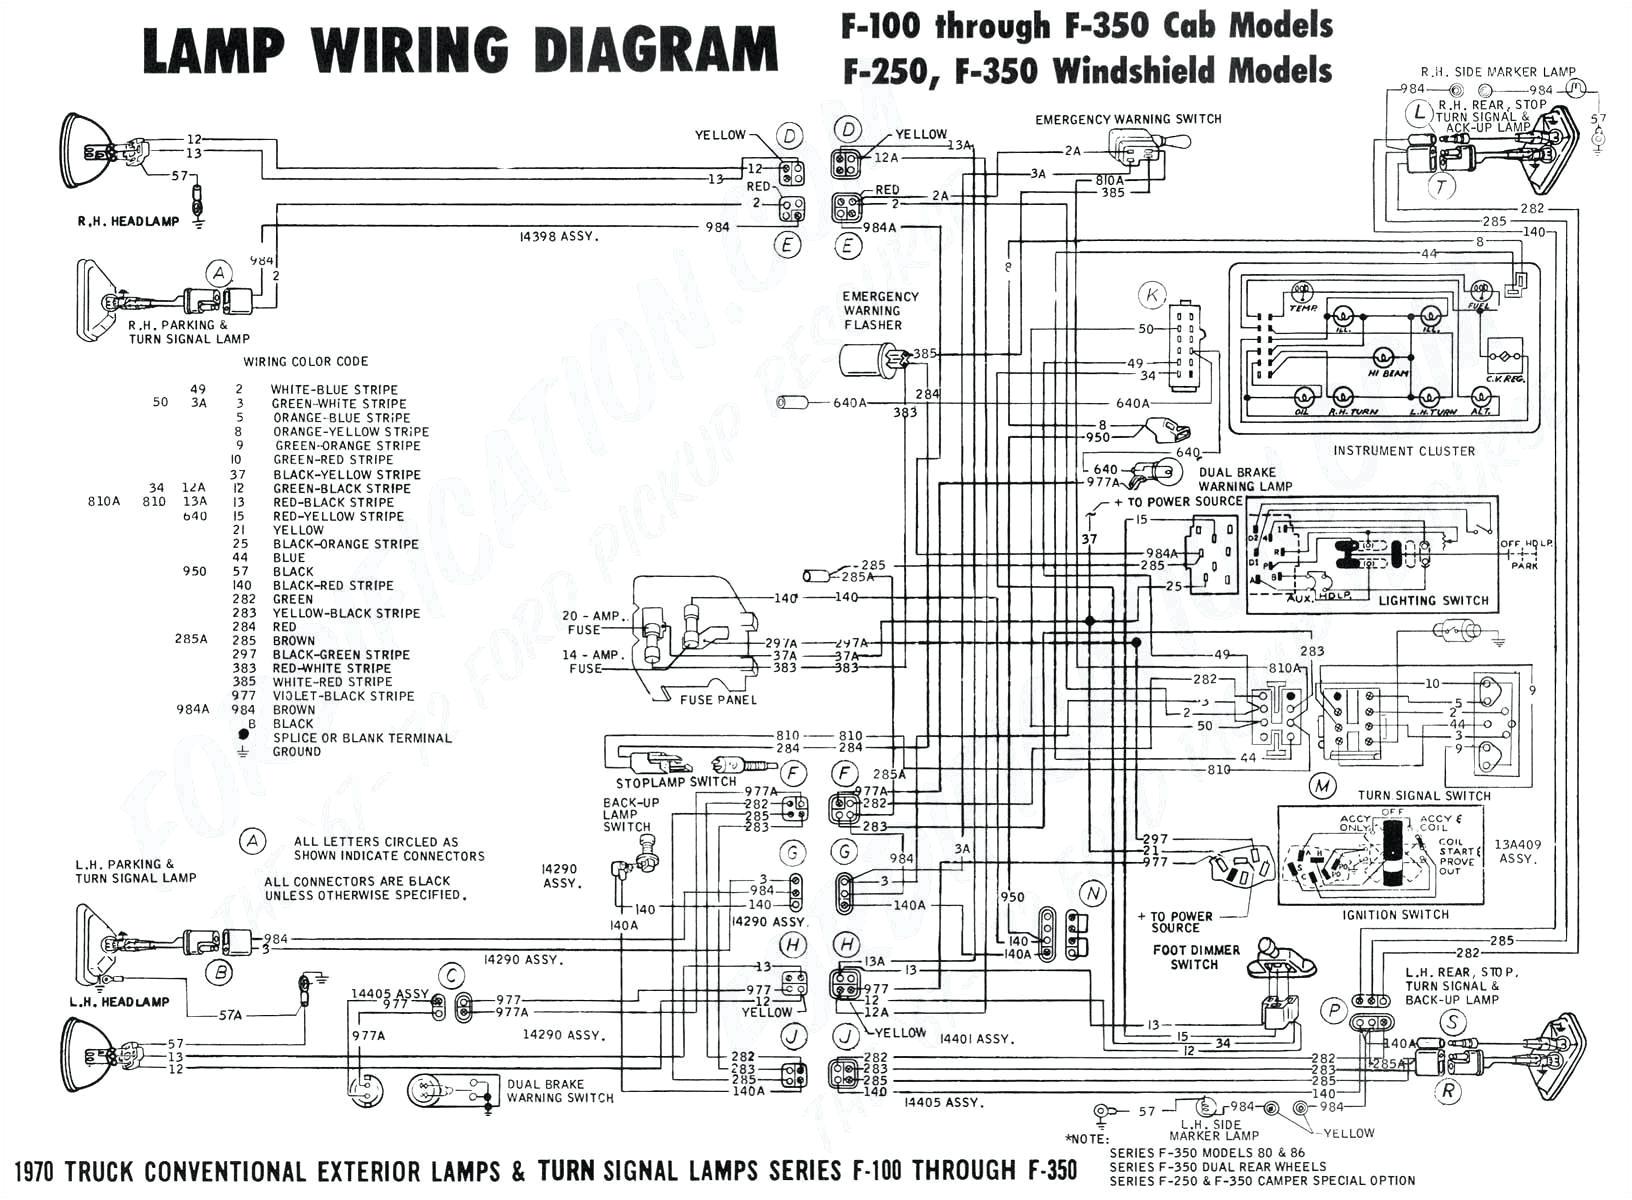 wiring diagram for 2005 dodge ram 1500 wiring diagram load